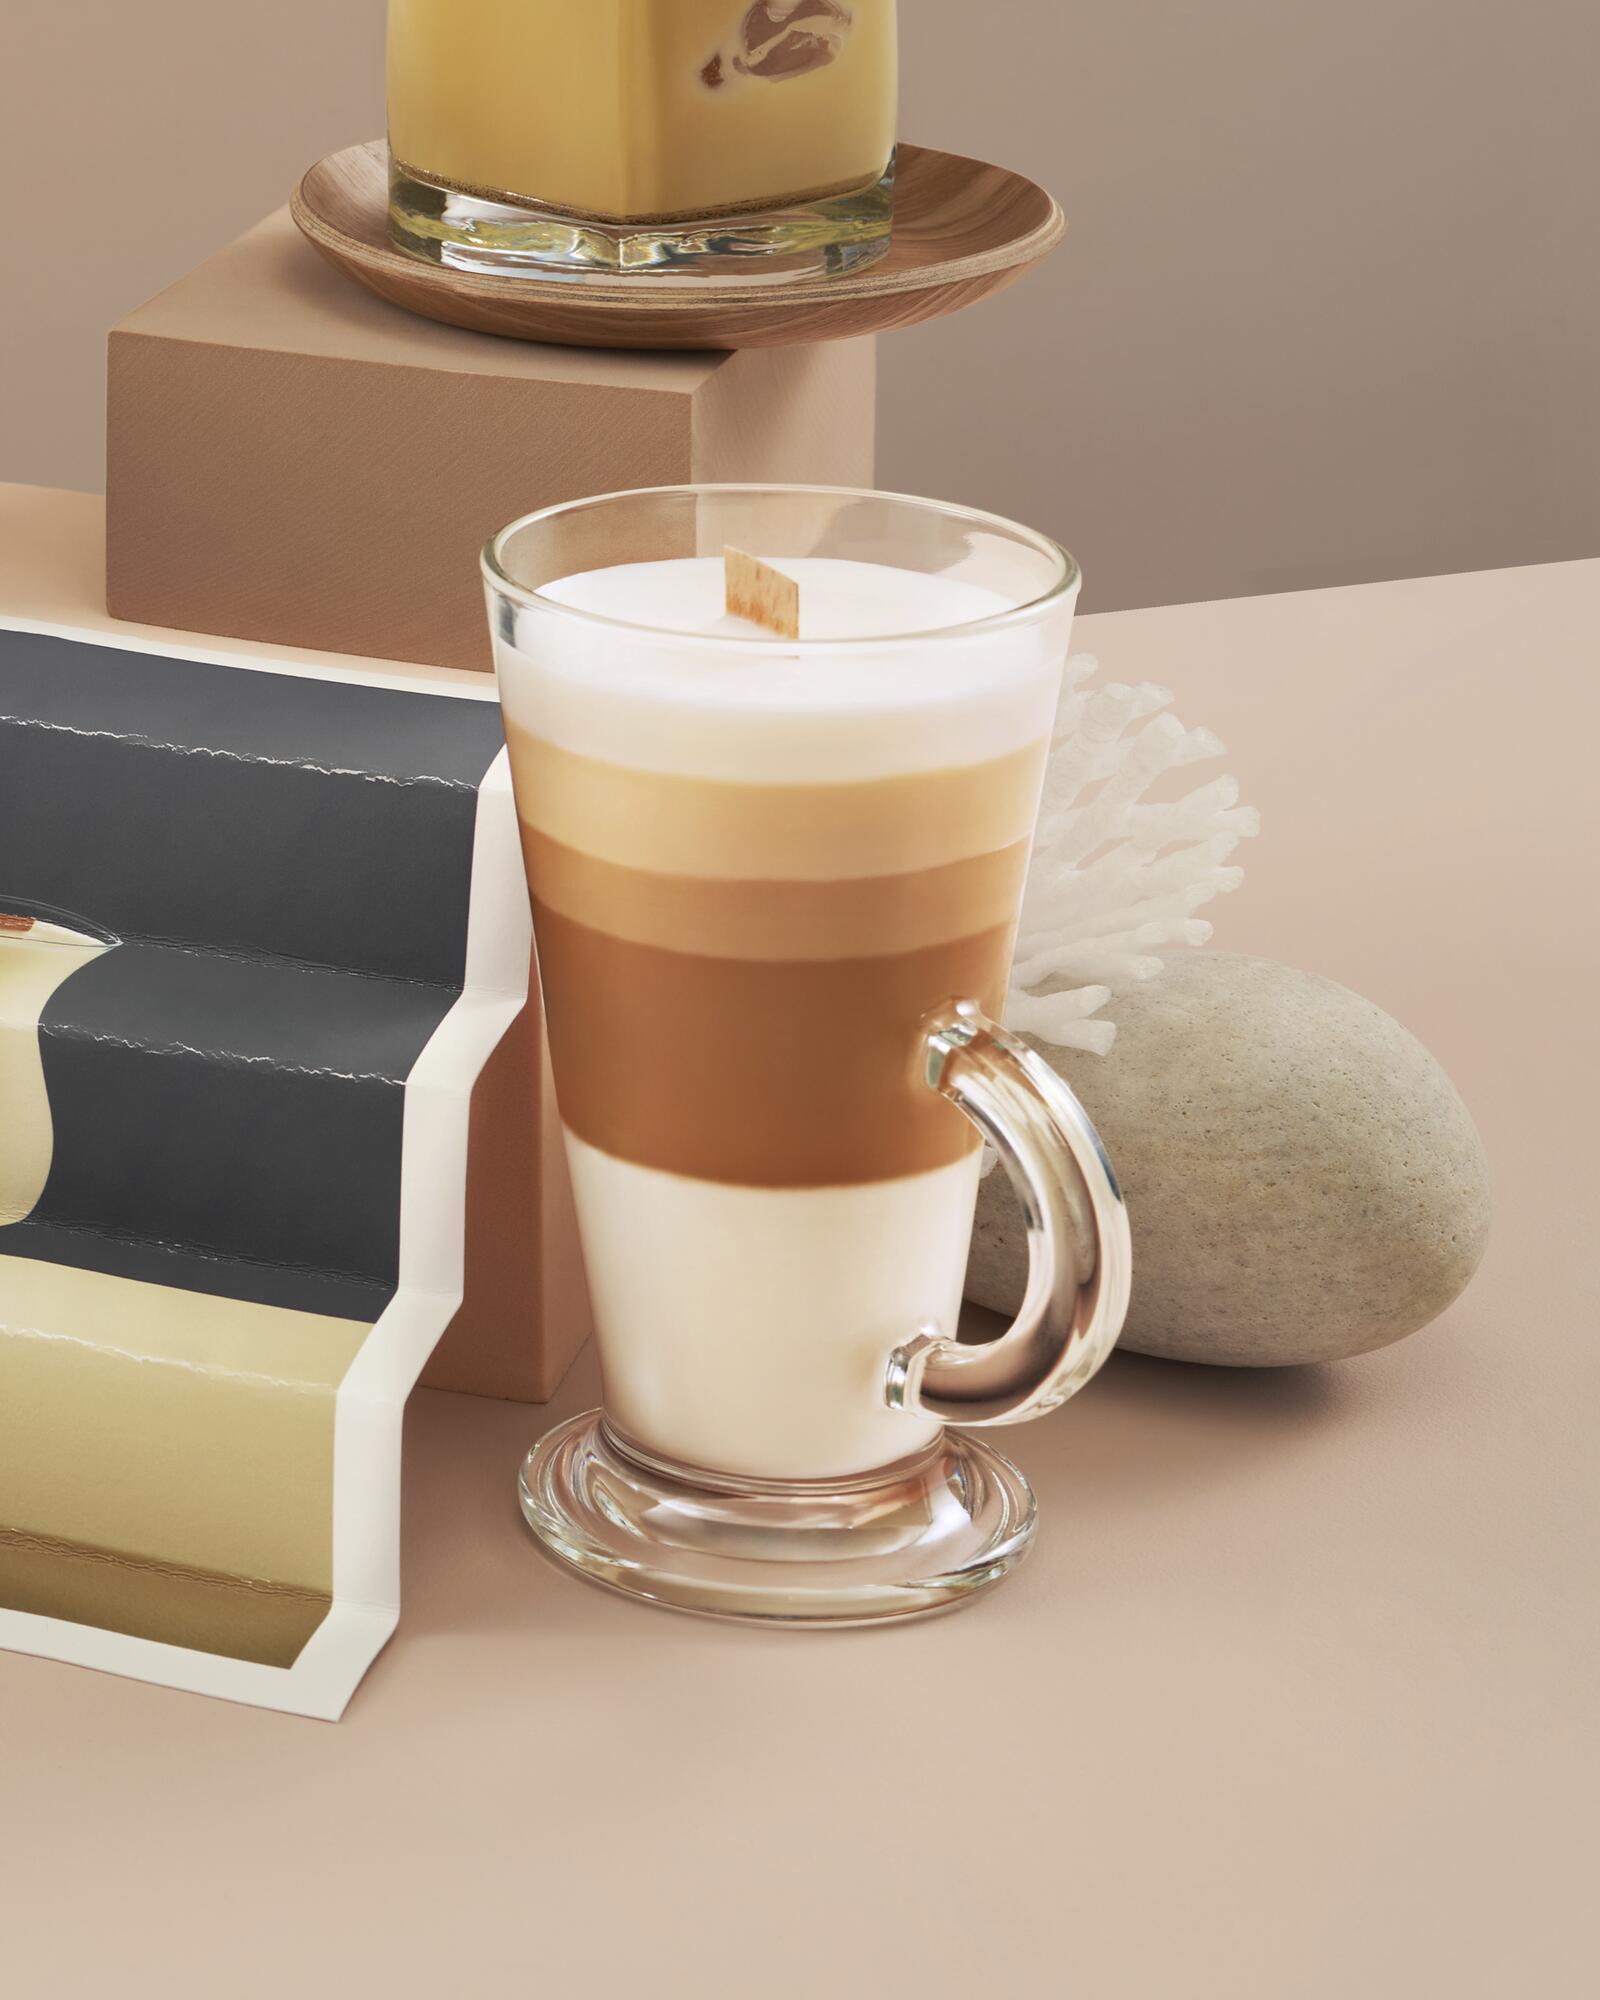 Caffe Latte - Candles Warsaw | JestemSlow.pl